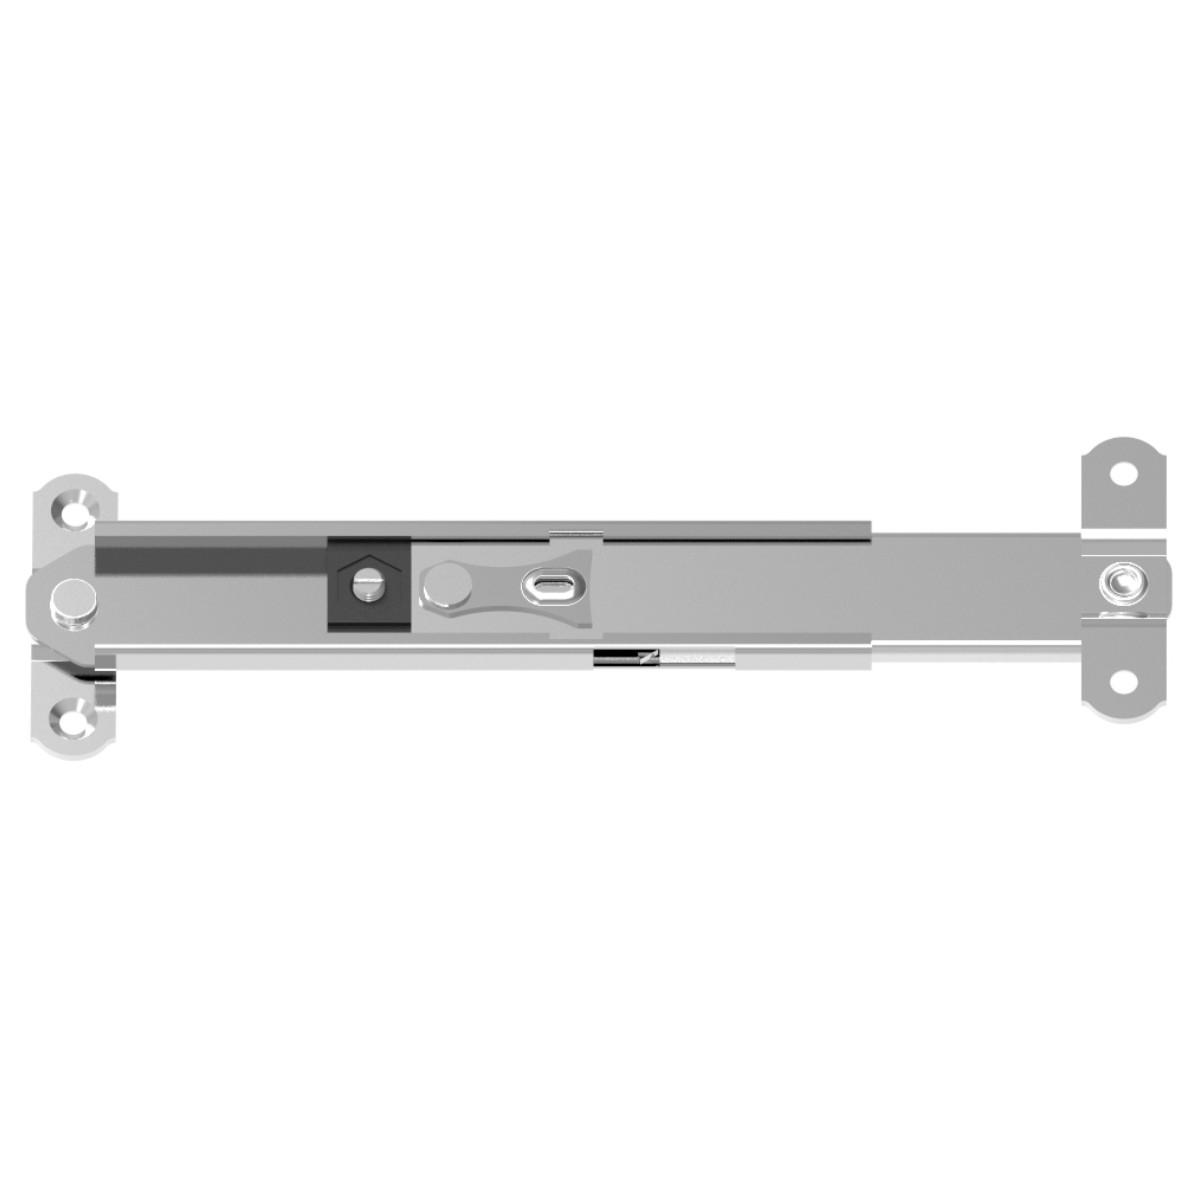 304#Stainless Steel Elastic Casemant Hinge